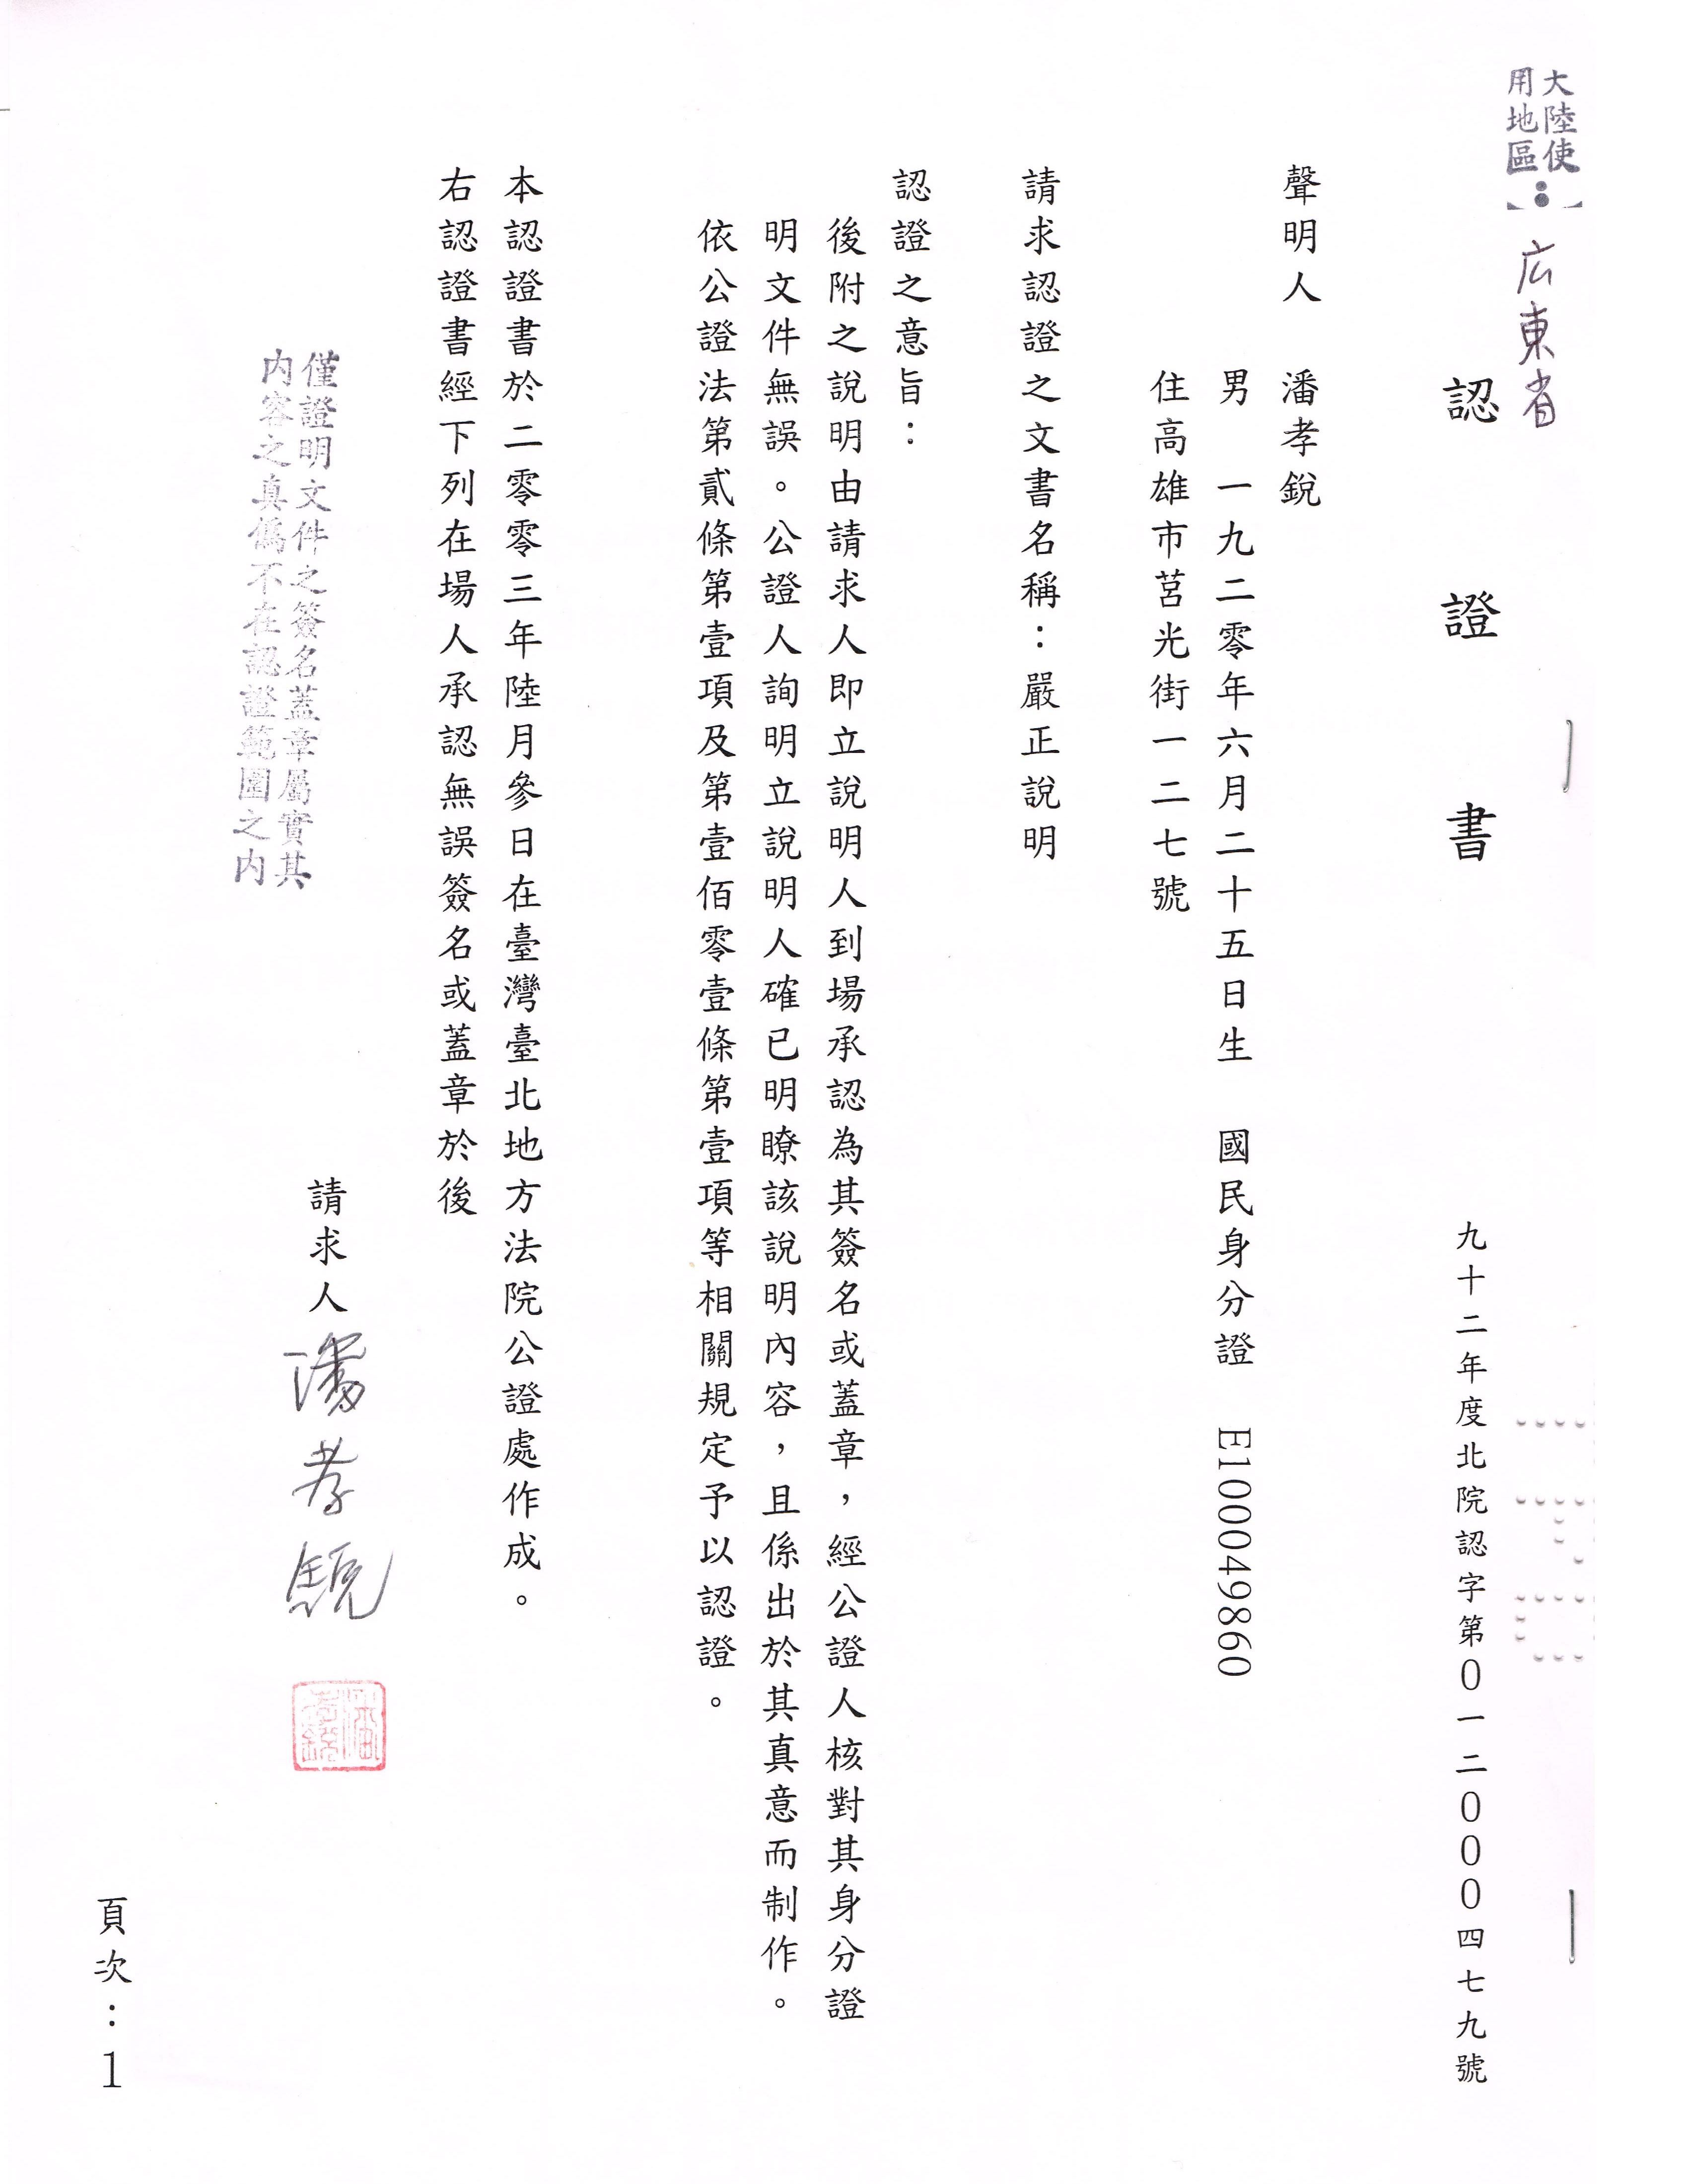 H.H.第三世多杰羌佛不收供養的部分證明_潘孝瑞證明Page1